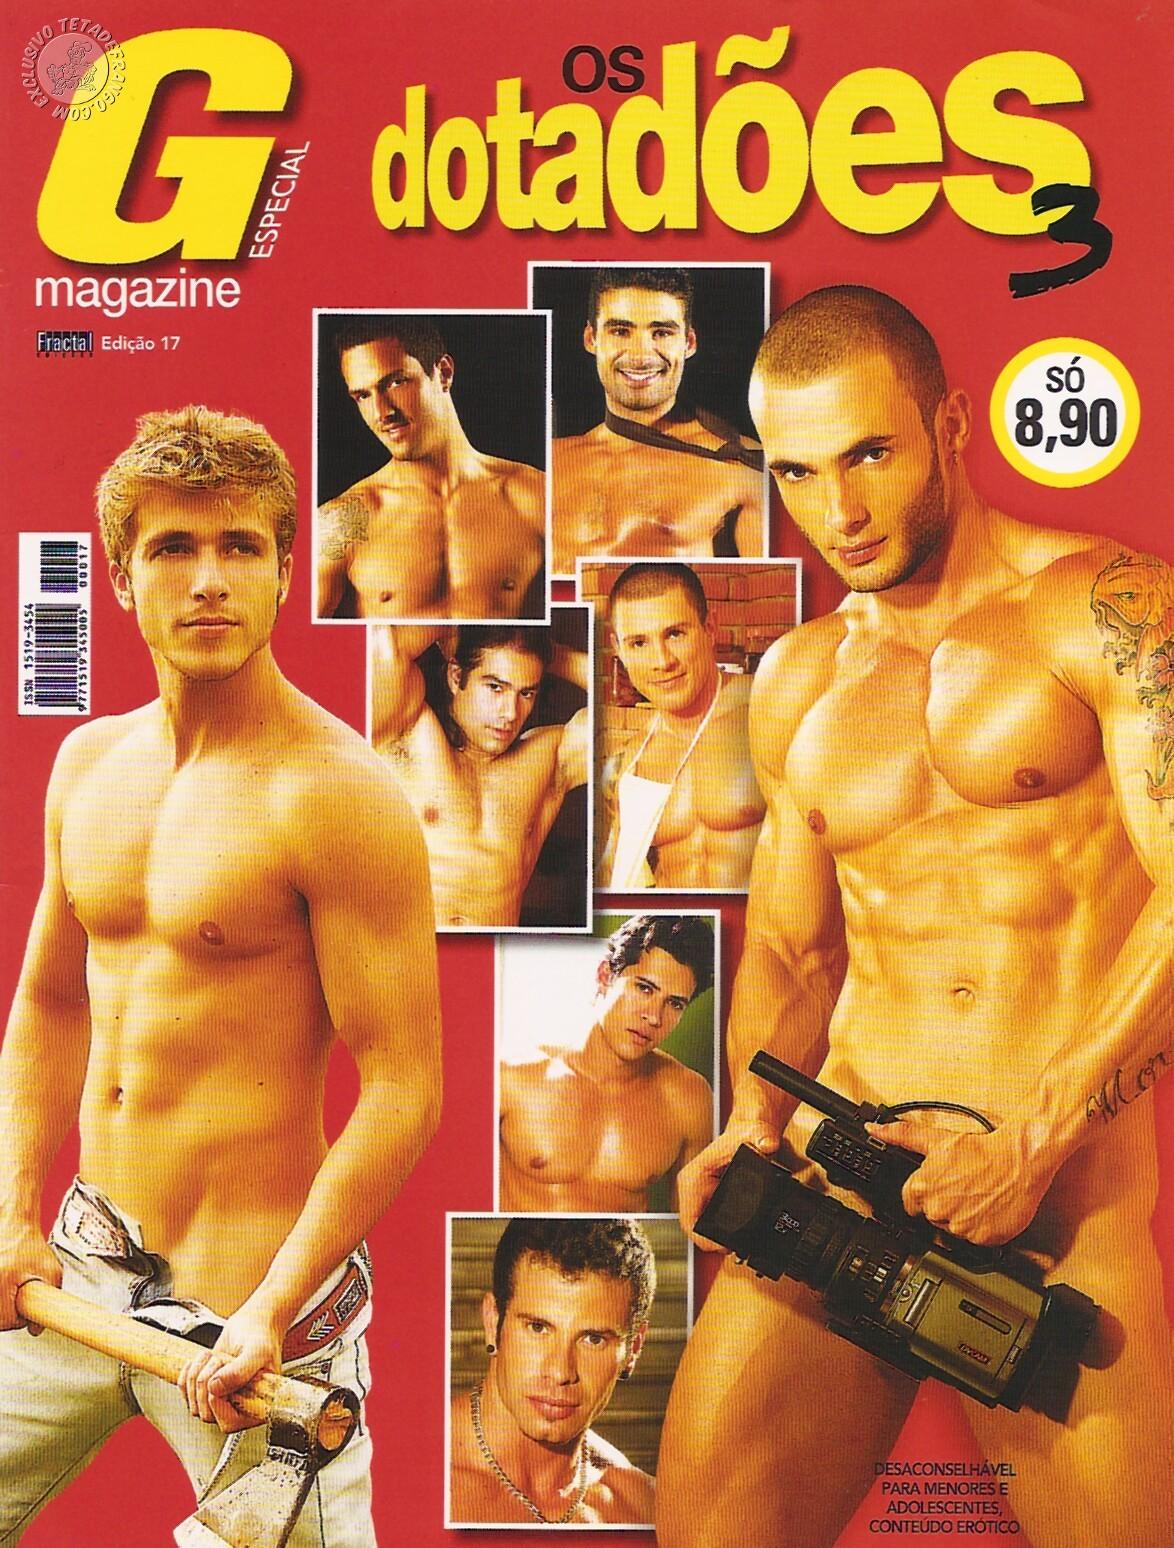 G Magazine - Os Dotadões